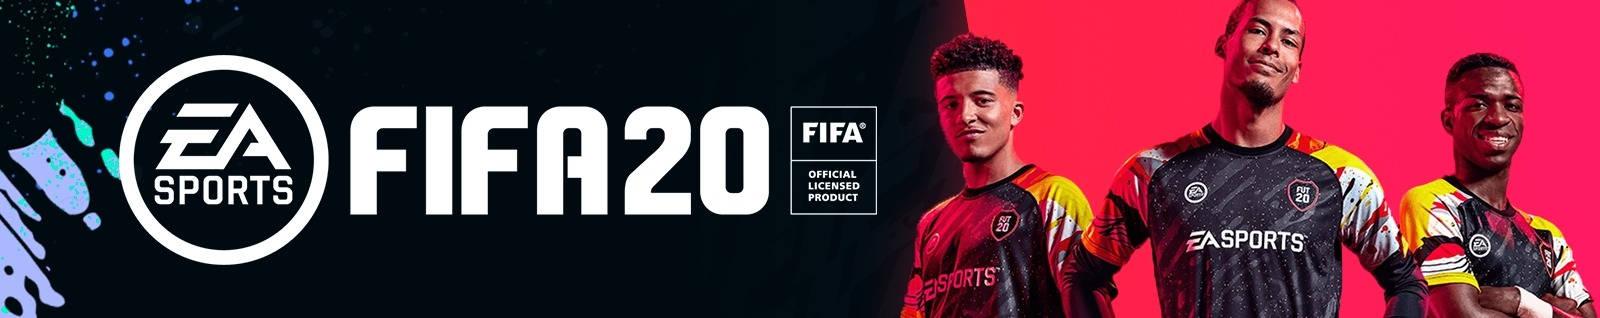 FIFA20_BANNER